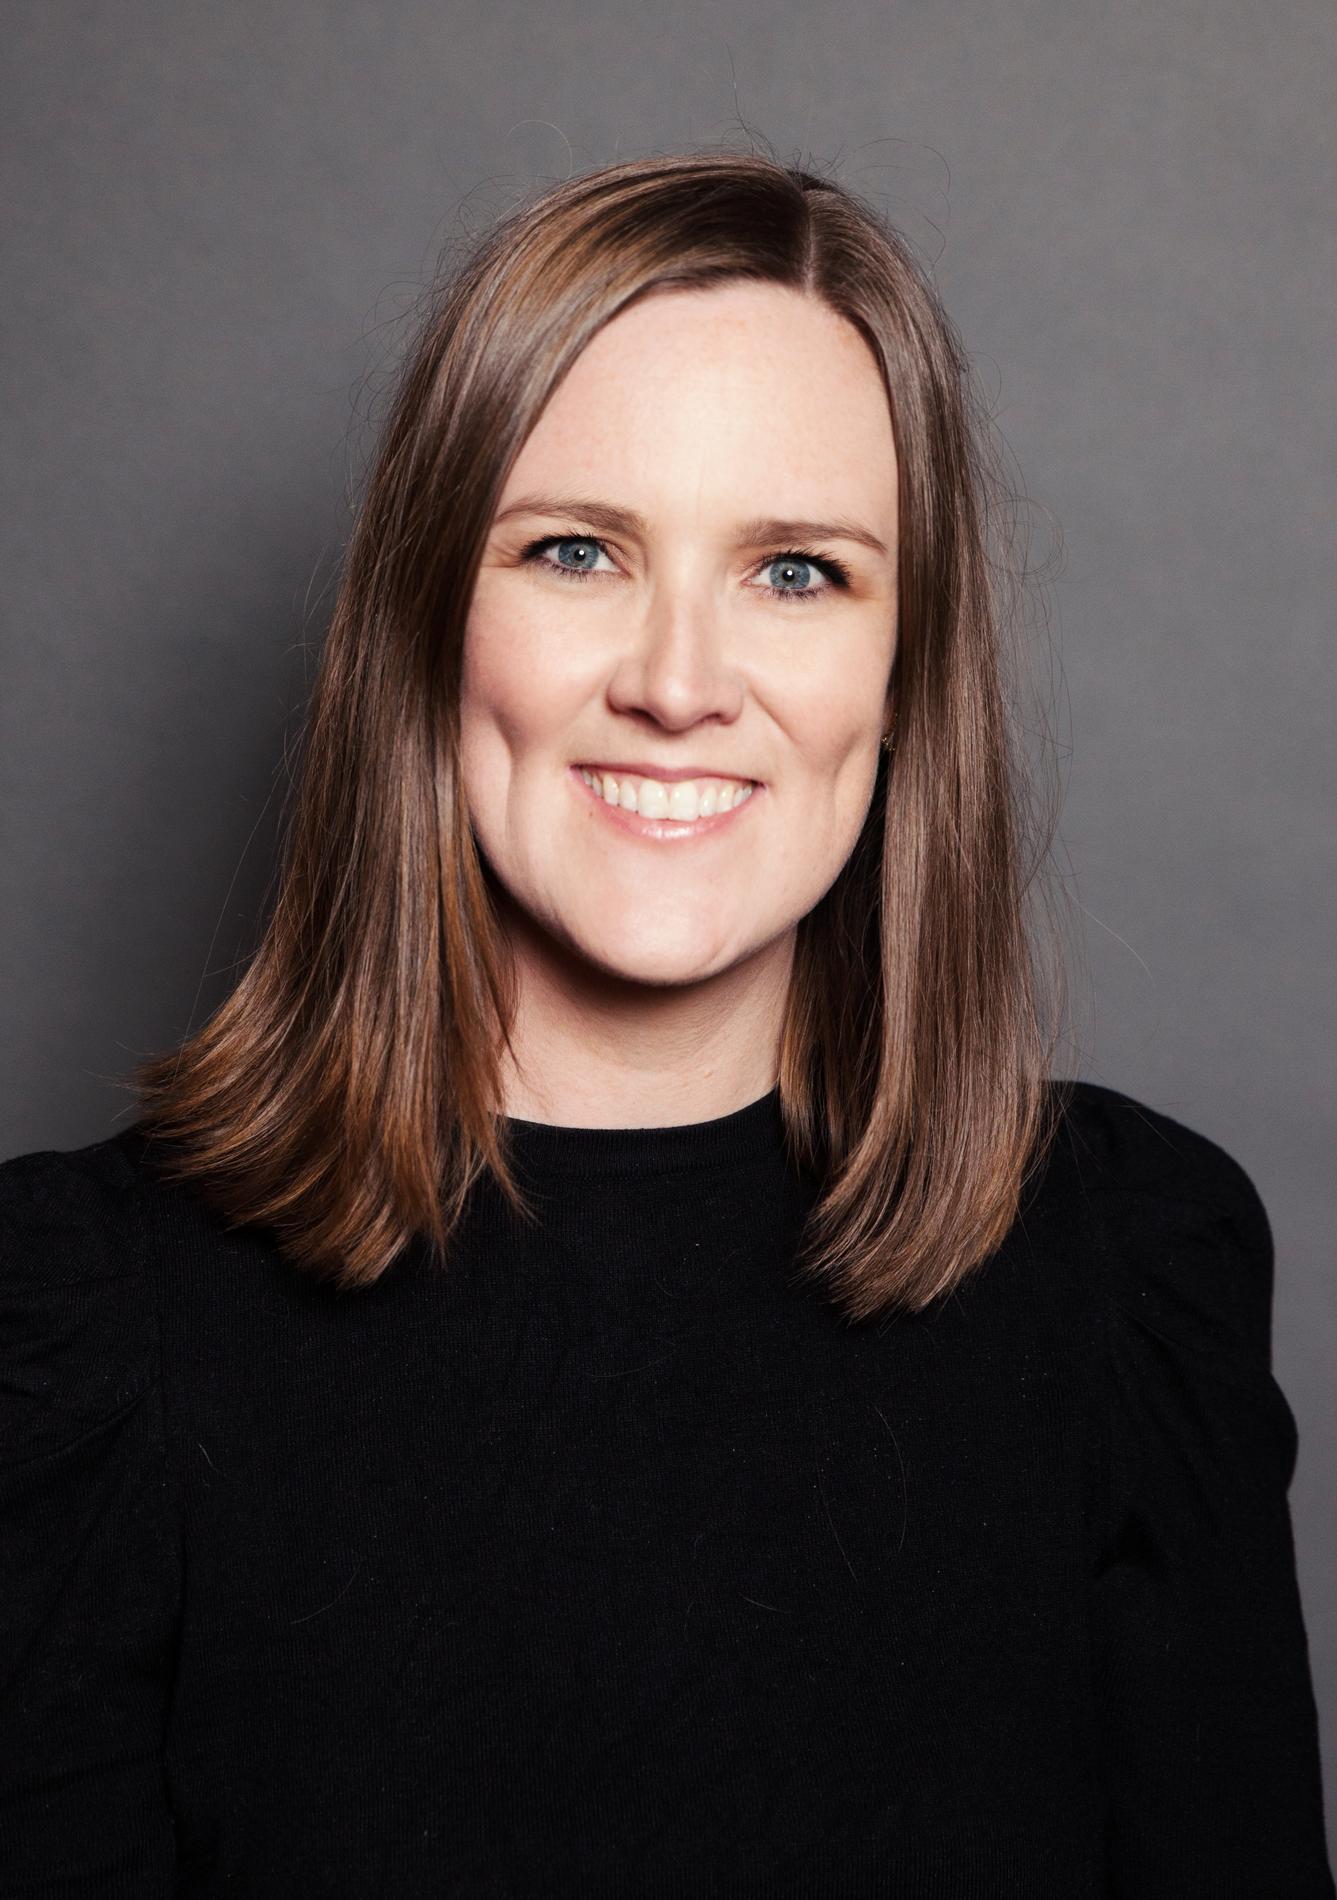 Nina T. Karlsen, dirigent for Ensemble 96. Foto © Anna-Julia Granberg, Blunderbuss (2020)